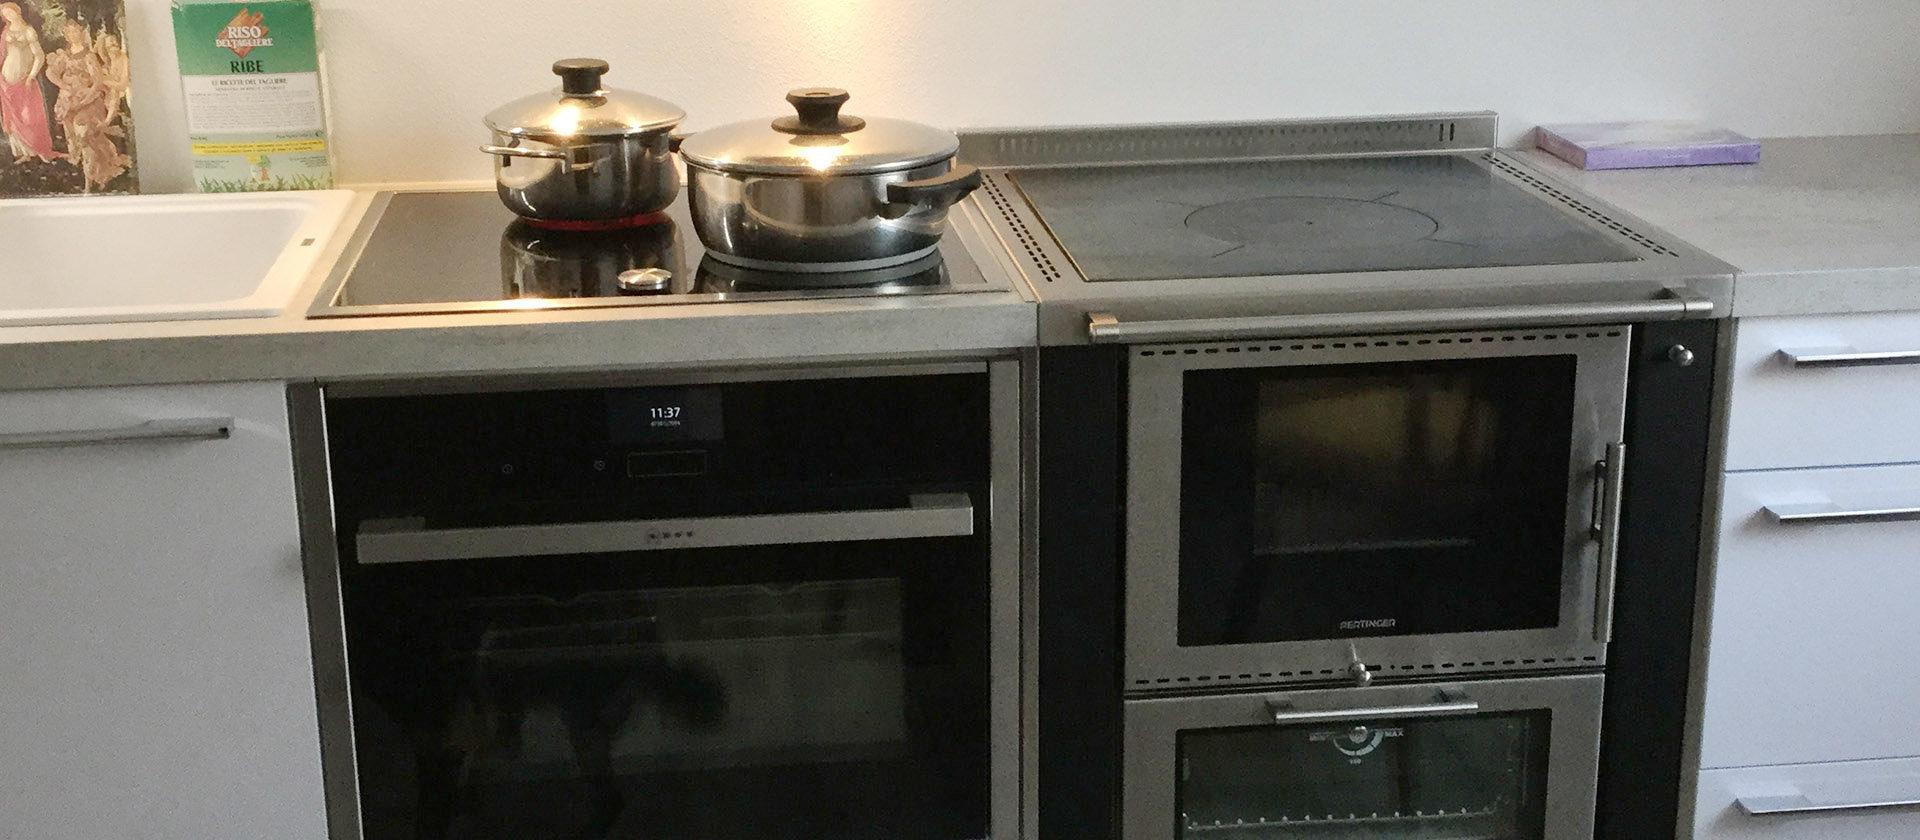 Stufa E Cucina A Legna.Cucine A Legna E Stufe Alto Adige Sudtirolkamin